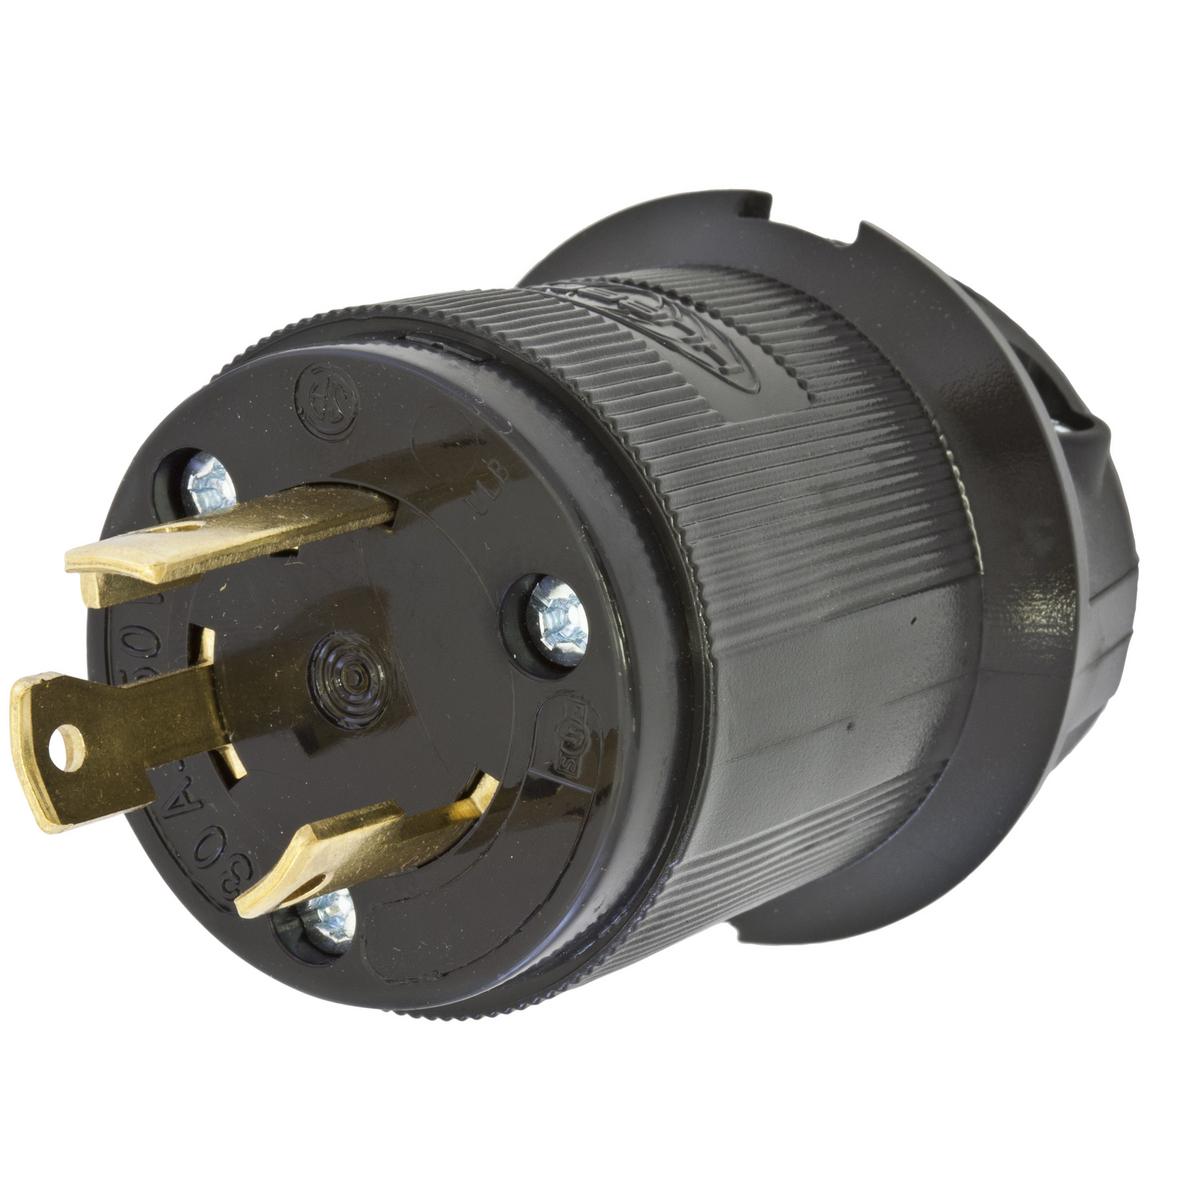 Hubbell HBL2621BK Locking Plug, 30A 250V, L6-30P, BK